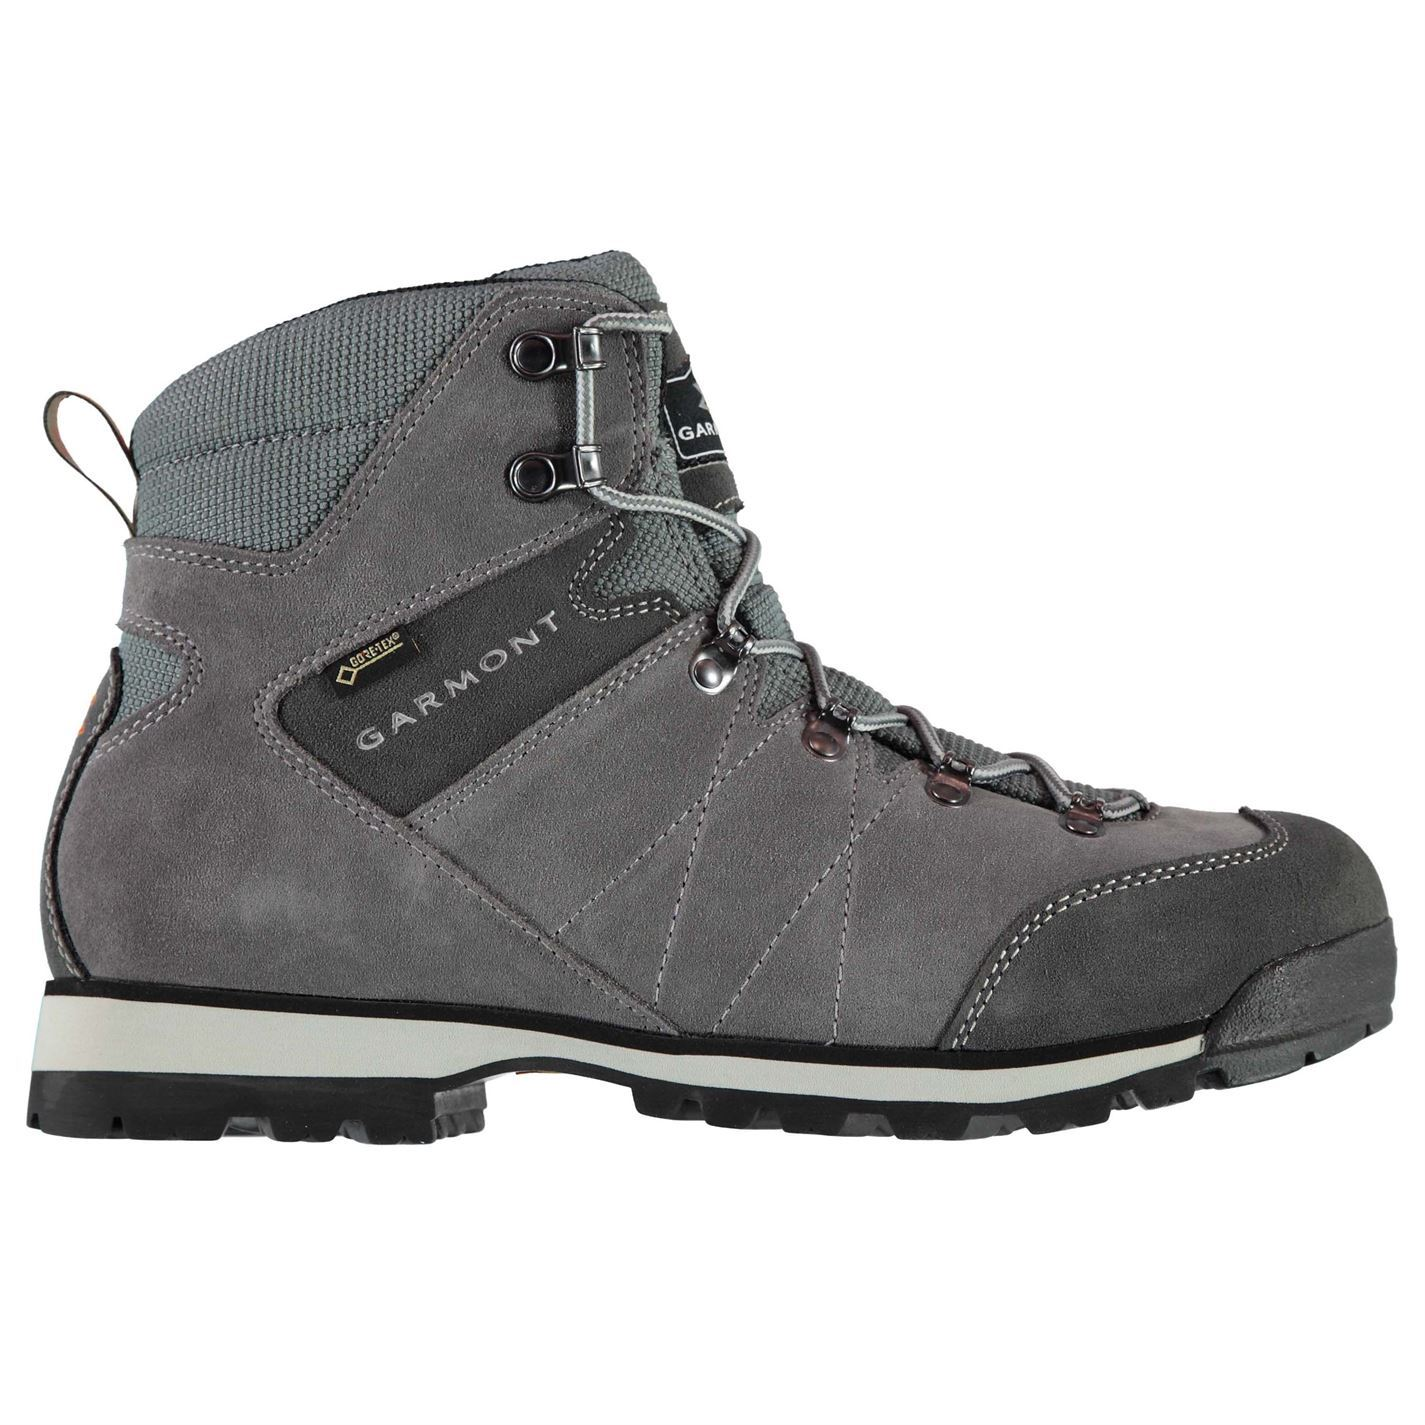 Garmont Mens Sierra Gtx Walking Boots Shoes Suede Gore Tex